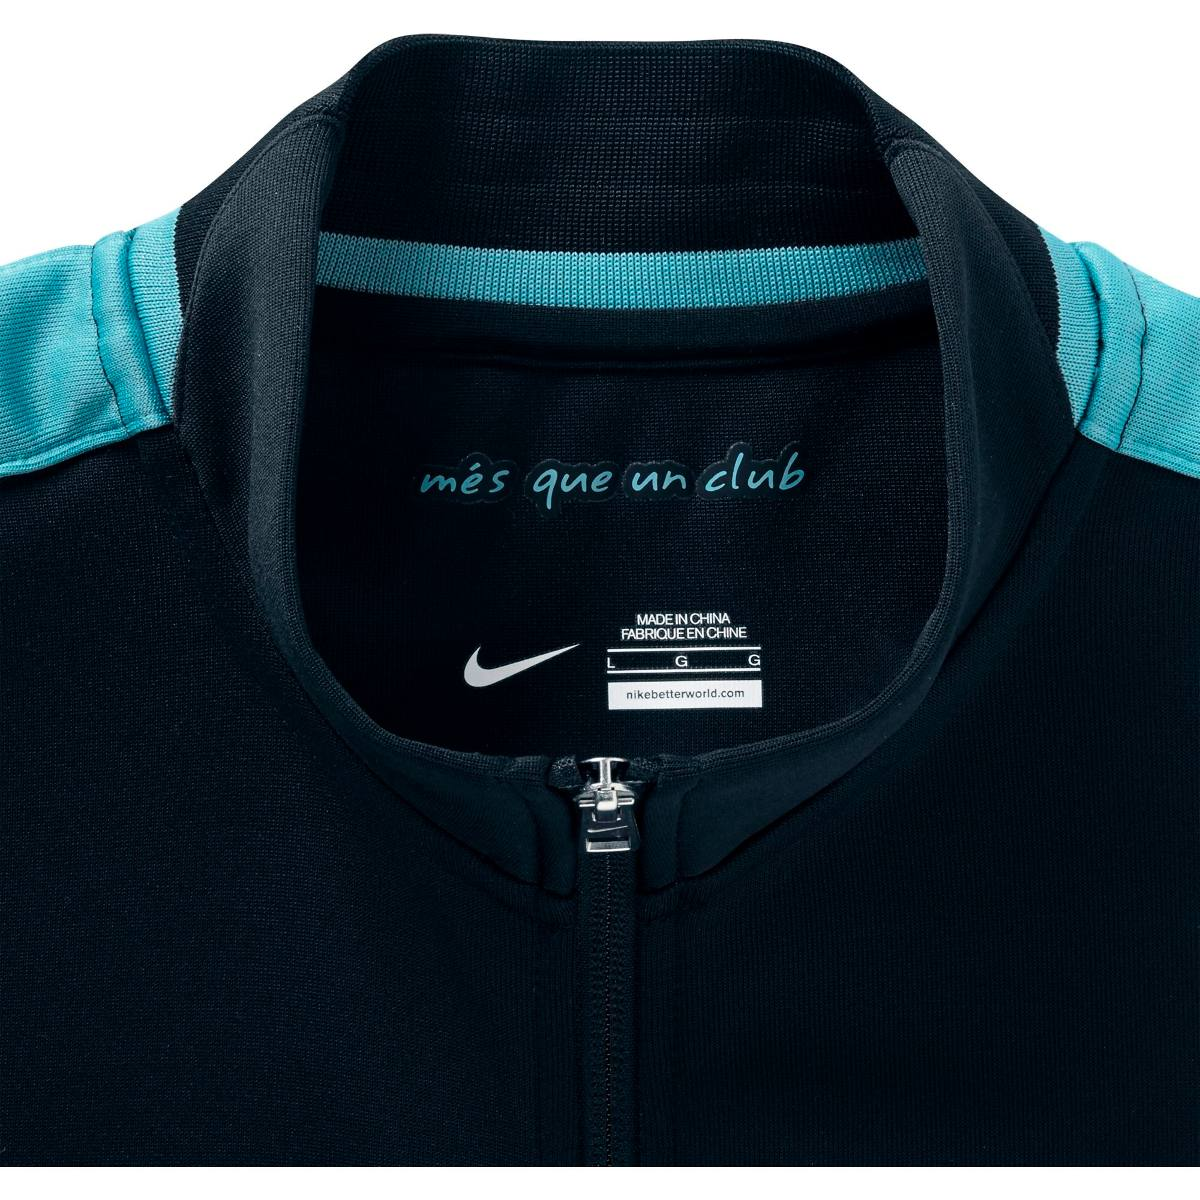 Jaqueta Nike Fc Barcelona Authentic Windrunner ✓ Labzada T Shirt 789a166bb9db3